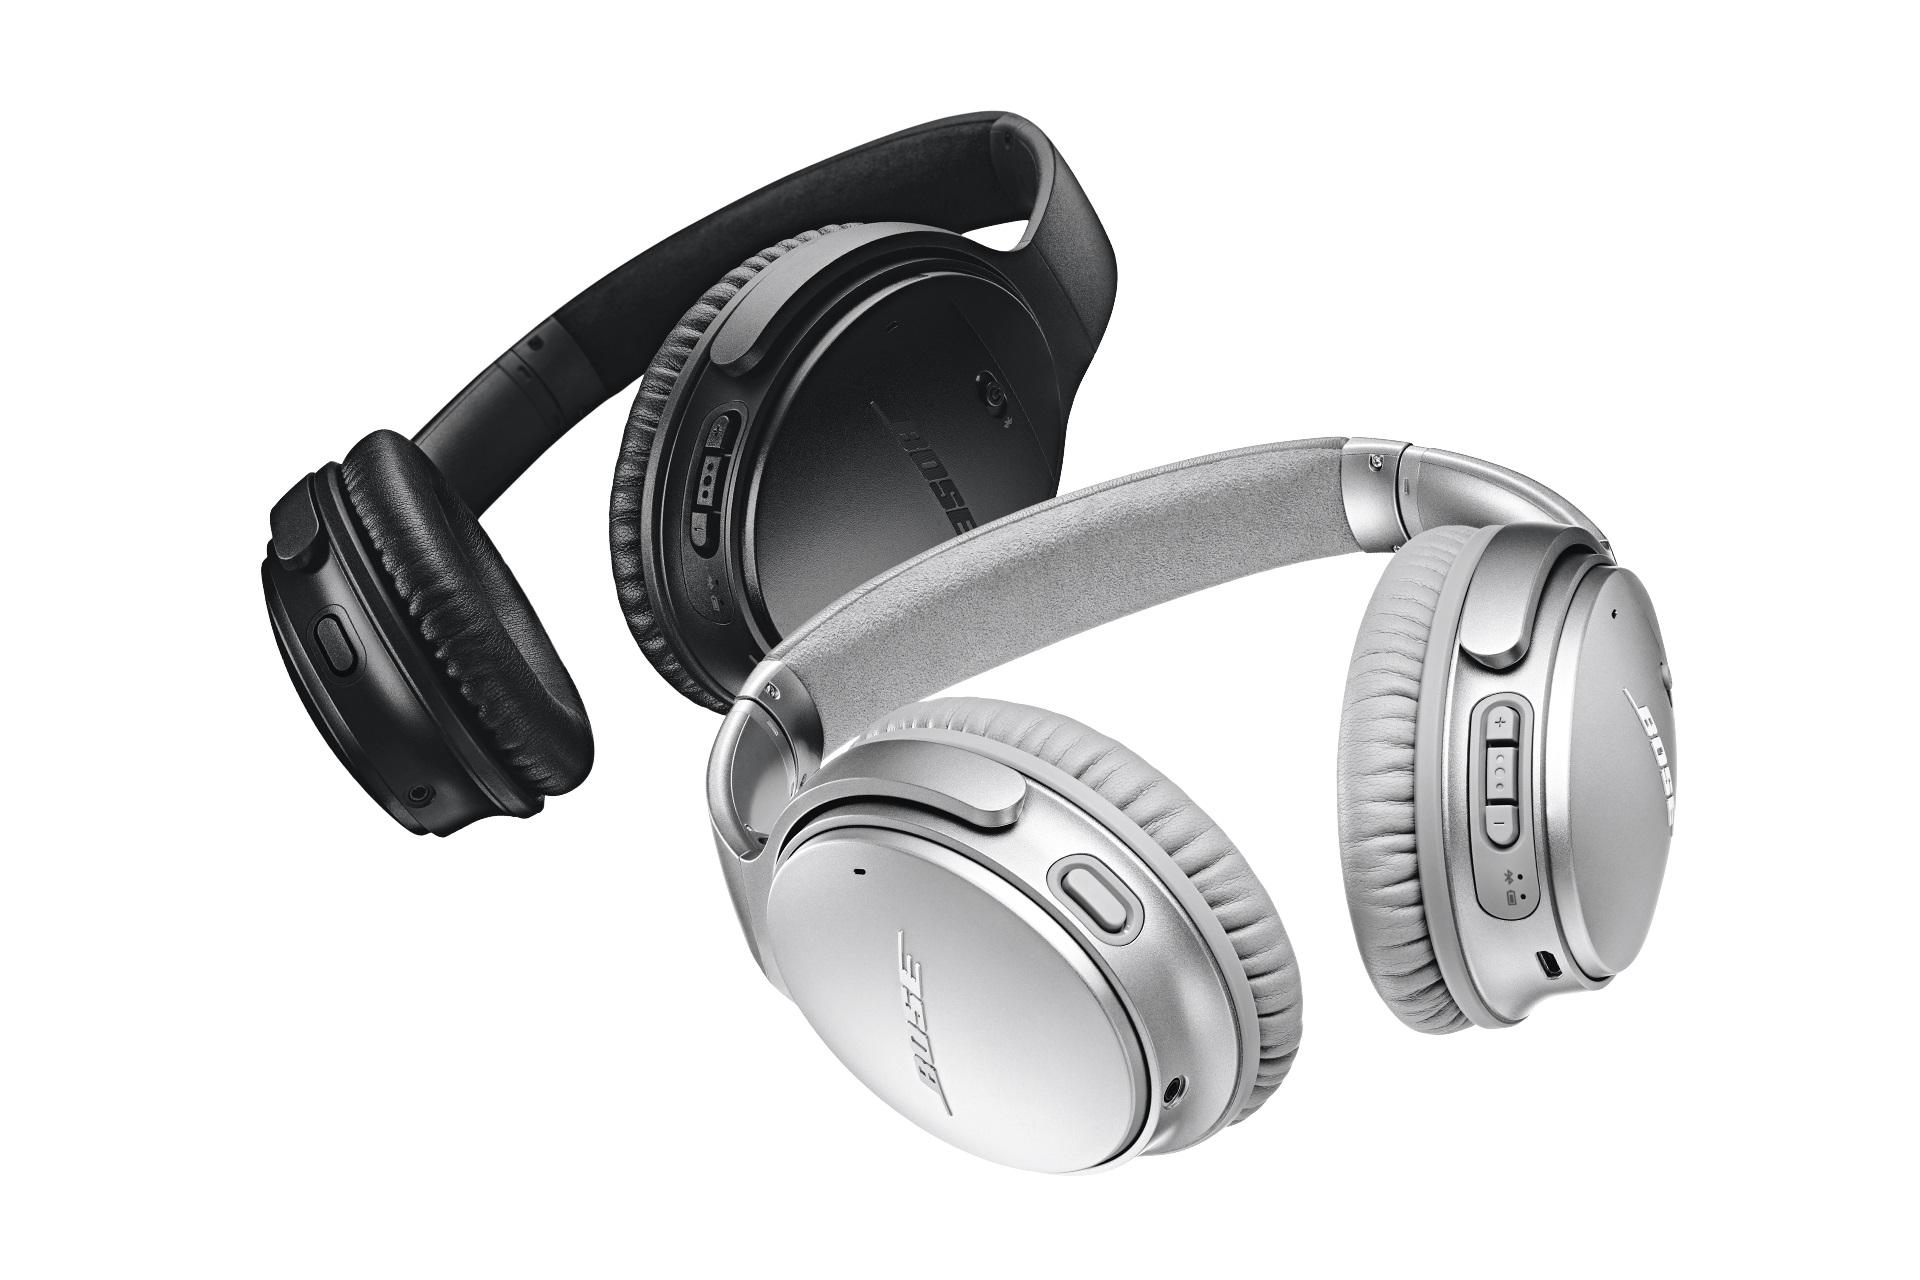 6b86ea72a40 Bose ABT Amazon Best Buy B&H Photo Frys Newegg Target Verizon Walmart